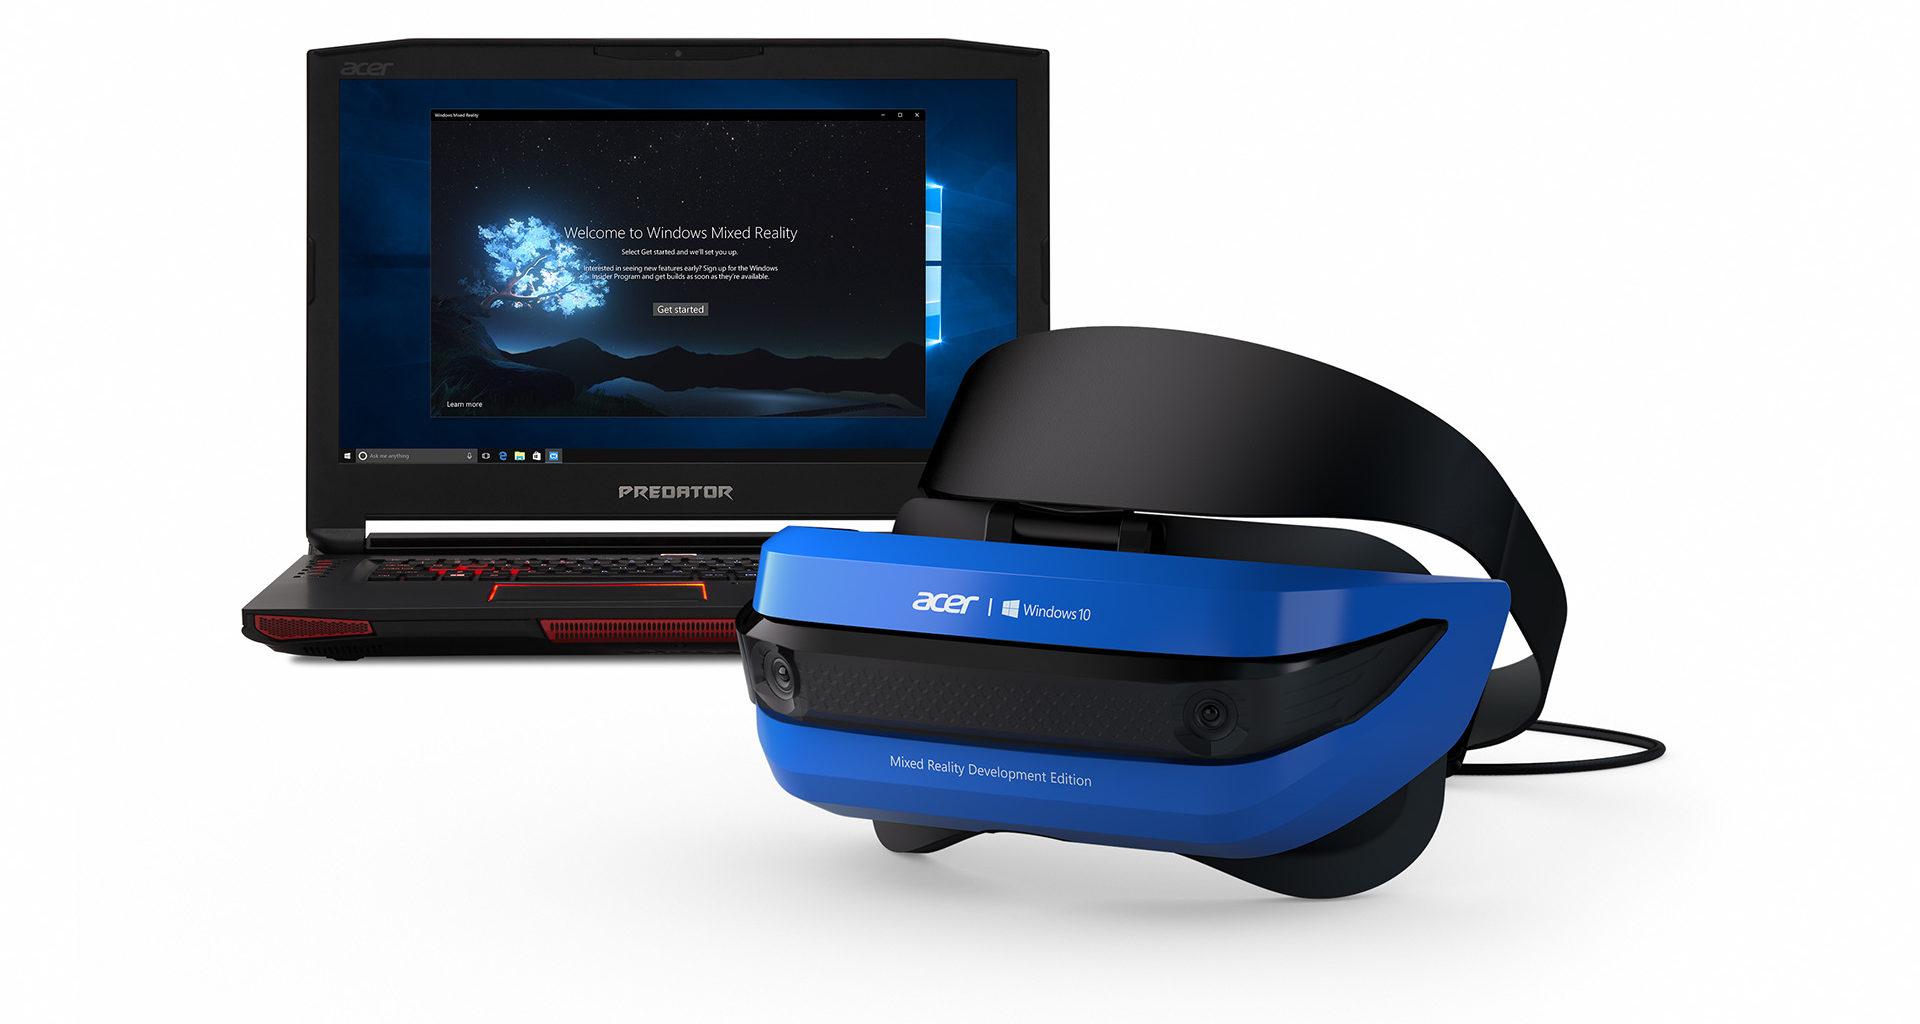 Acer-Windows-Mixed-Reality-Development-Edition-headset-1920x1024